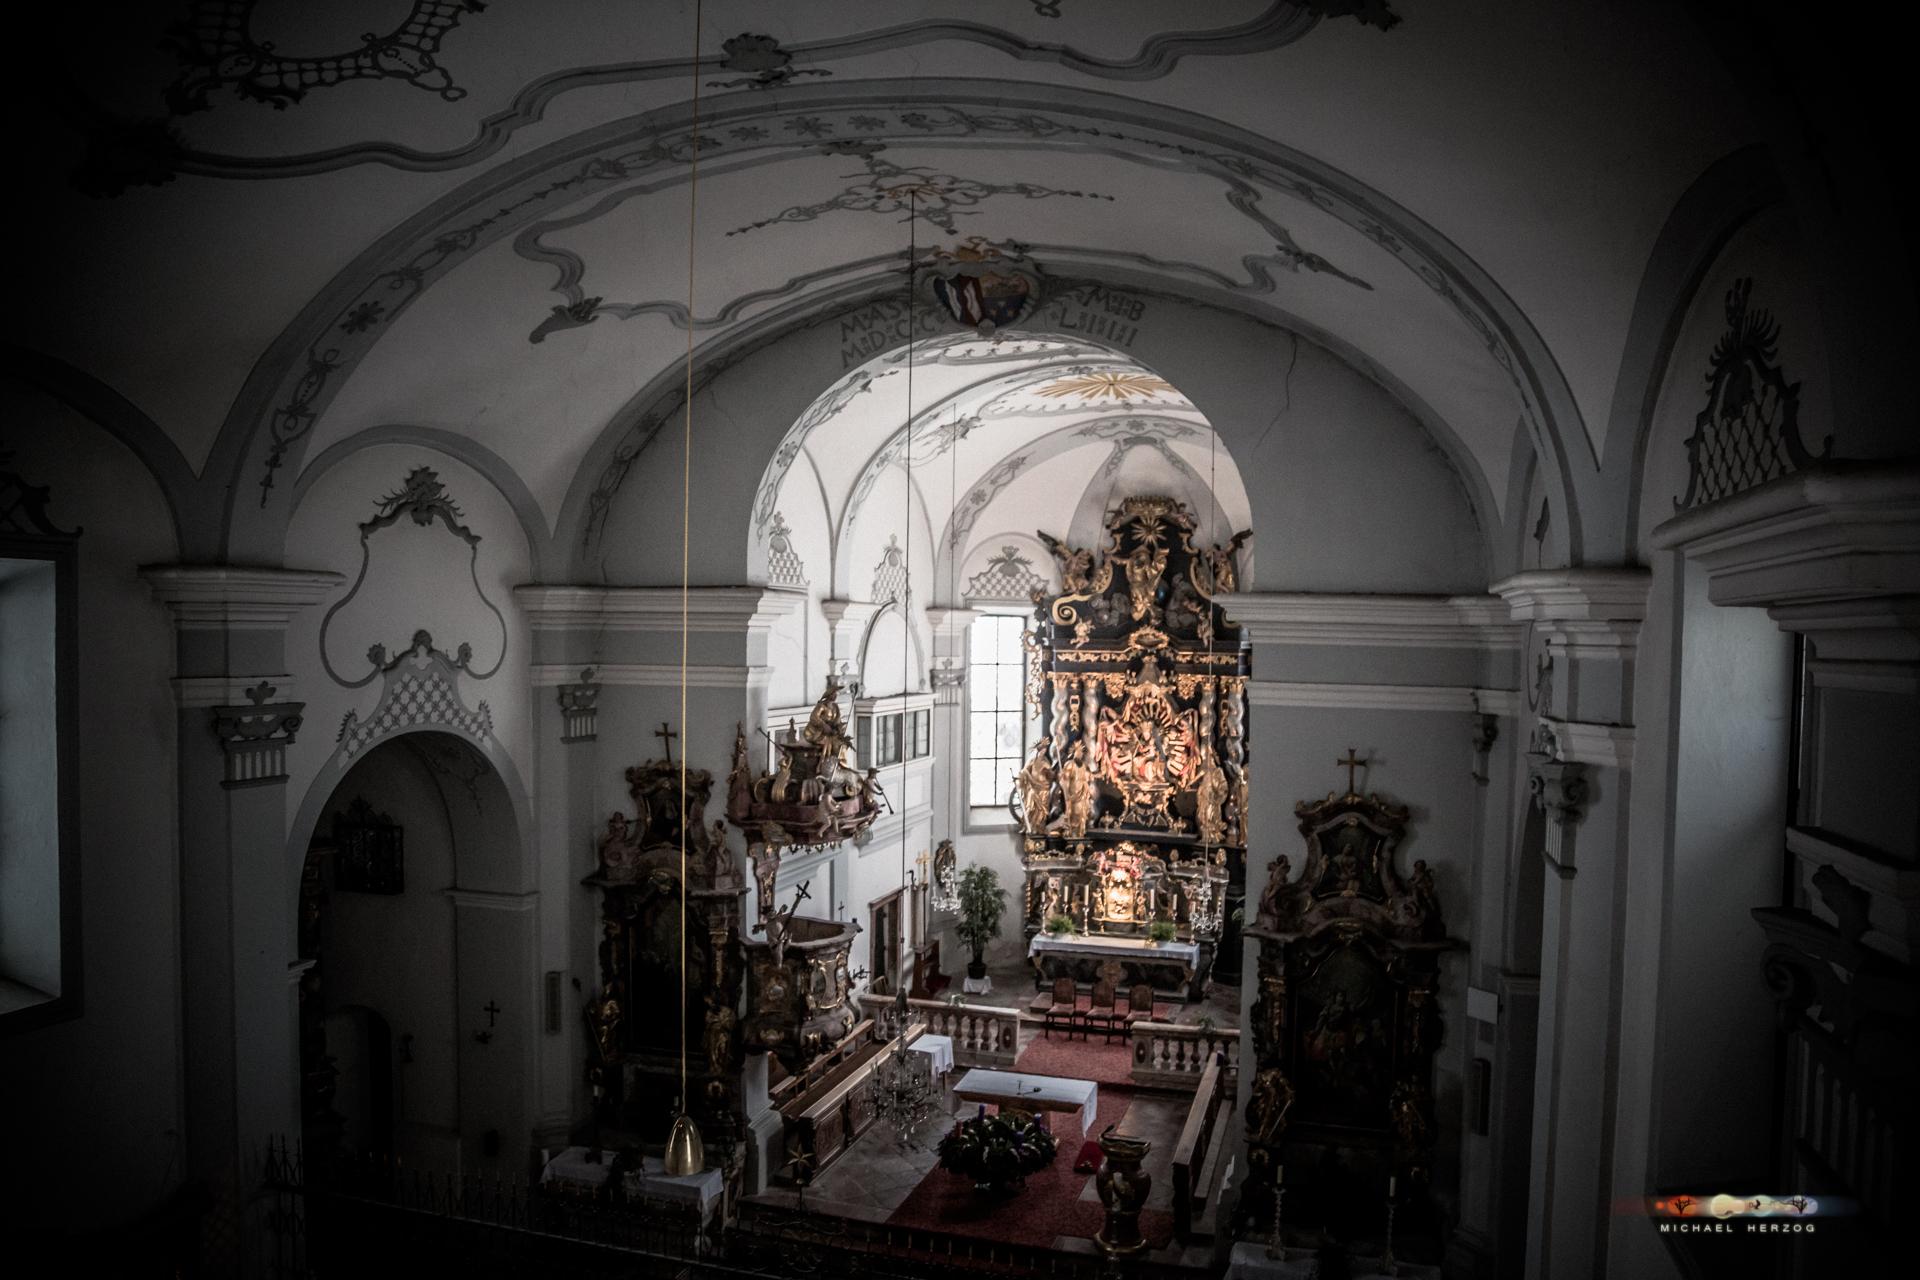 Arnsdorf_Kirche_2017_MichaelHerzog-9151.jpg